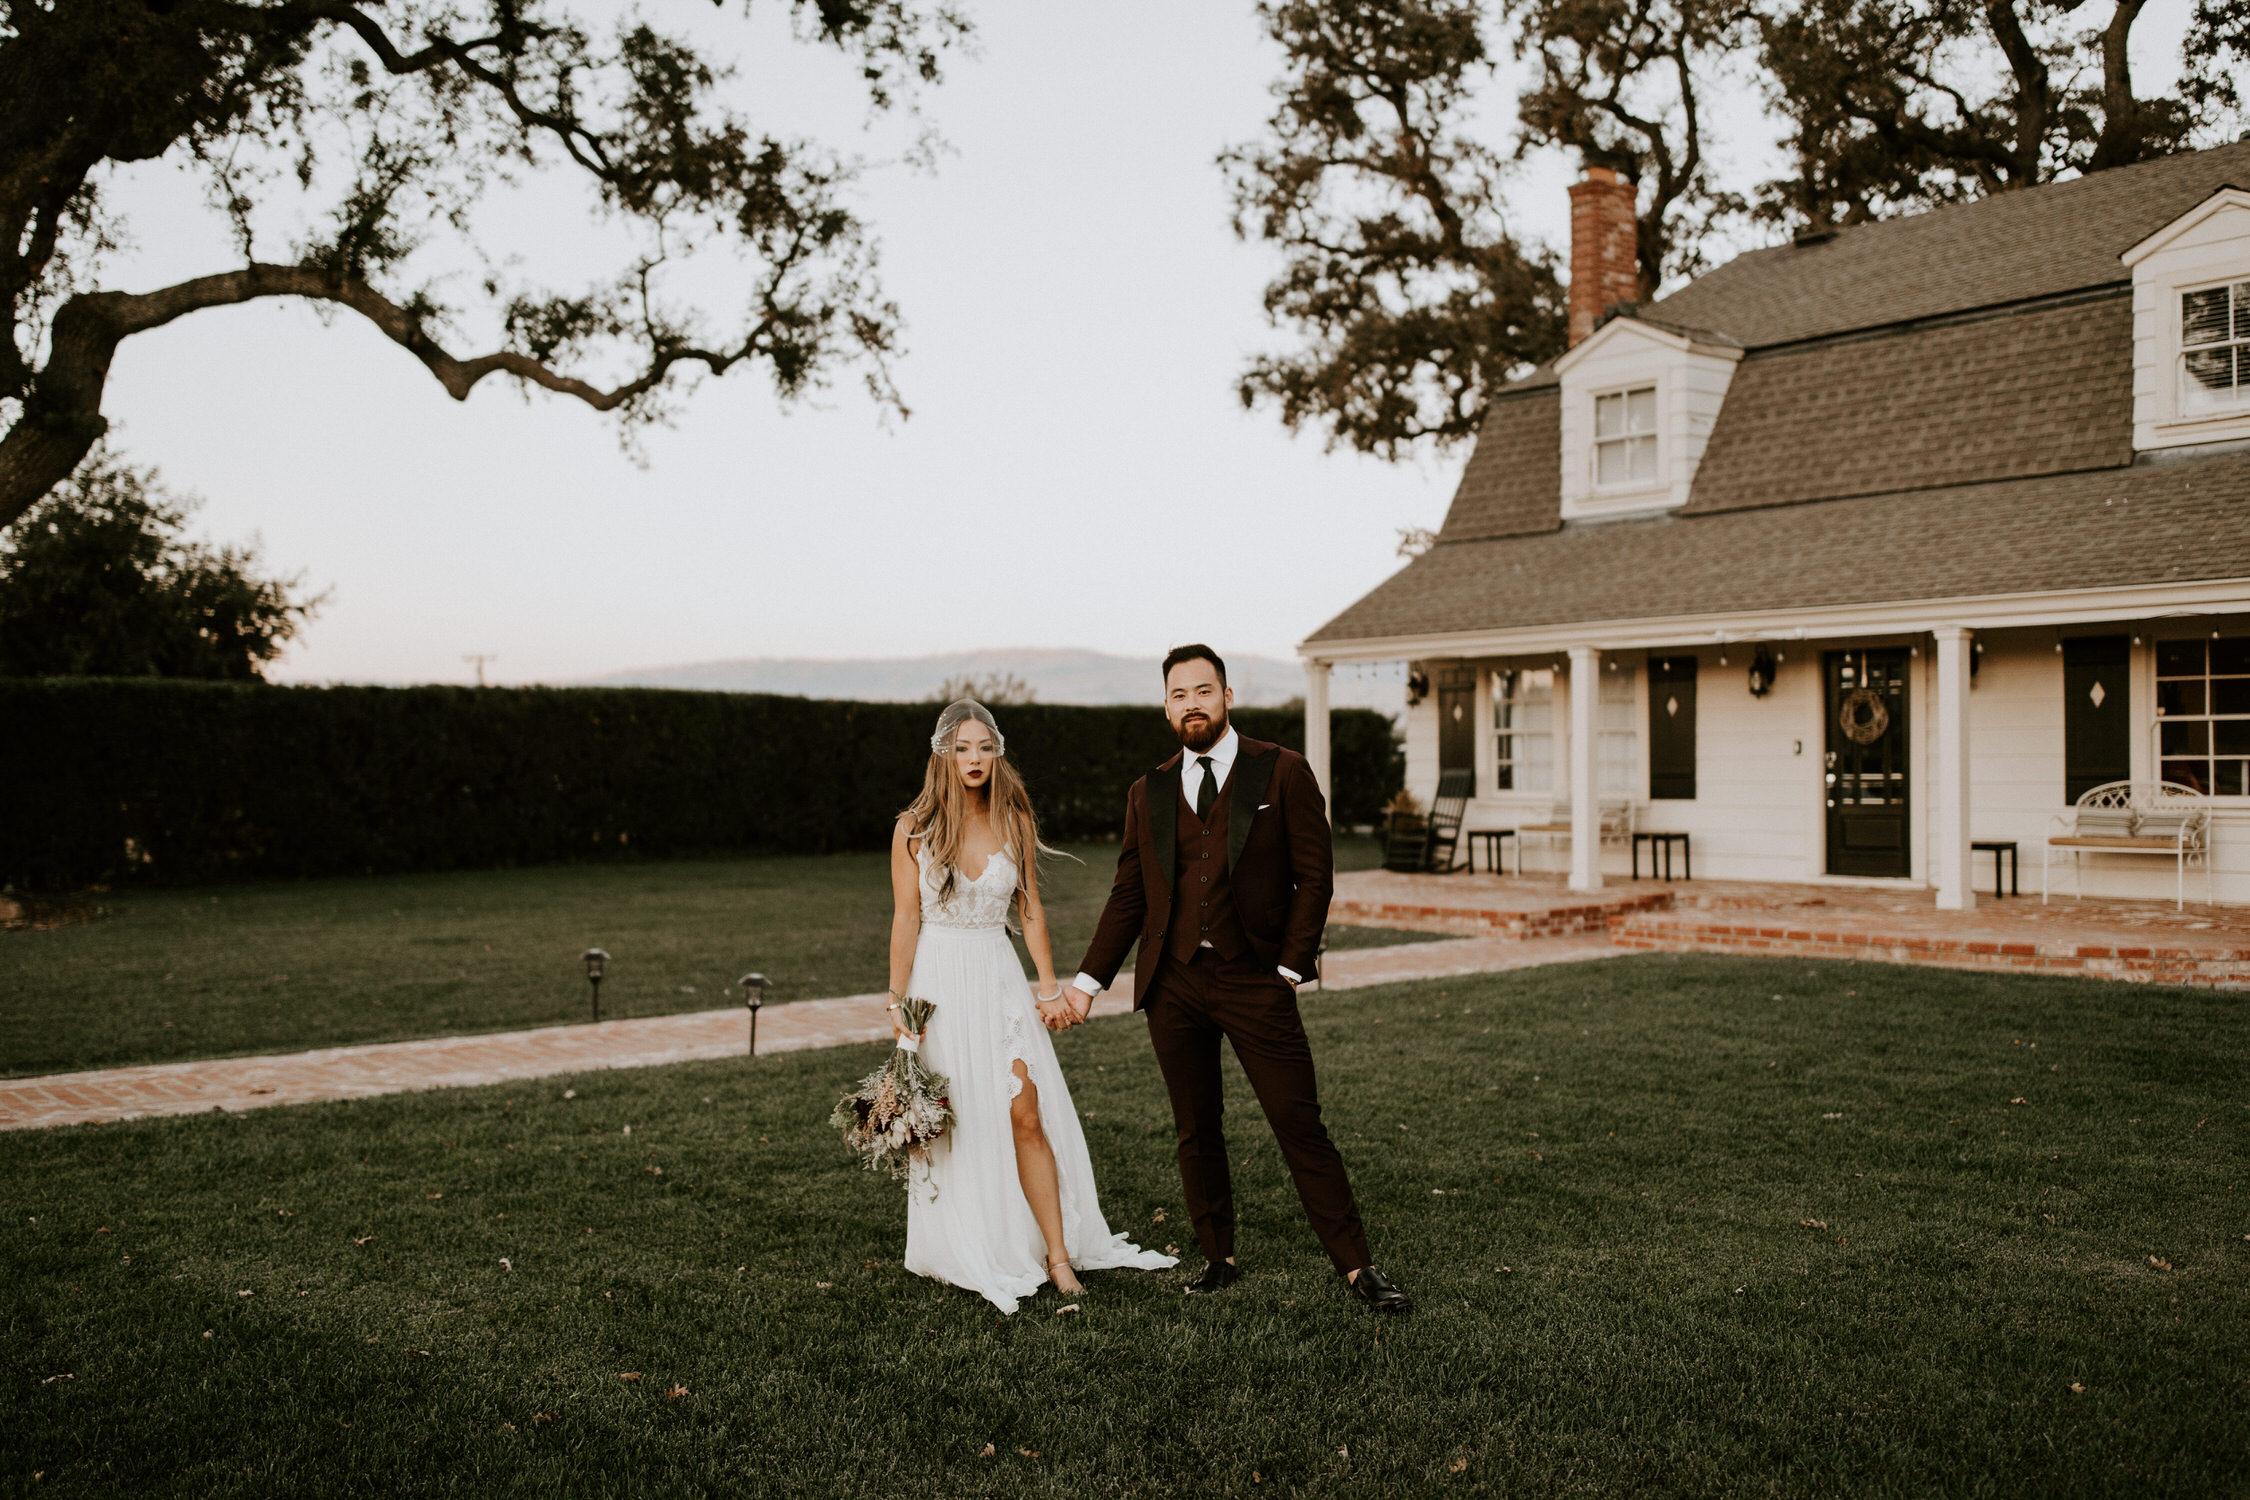 couple-intimate-wedding-northern-california-156.jpg